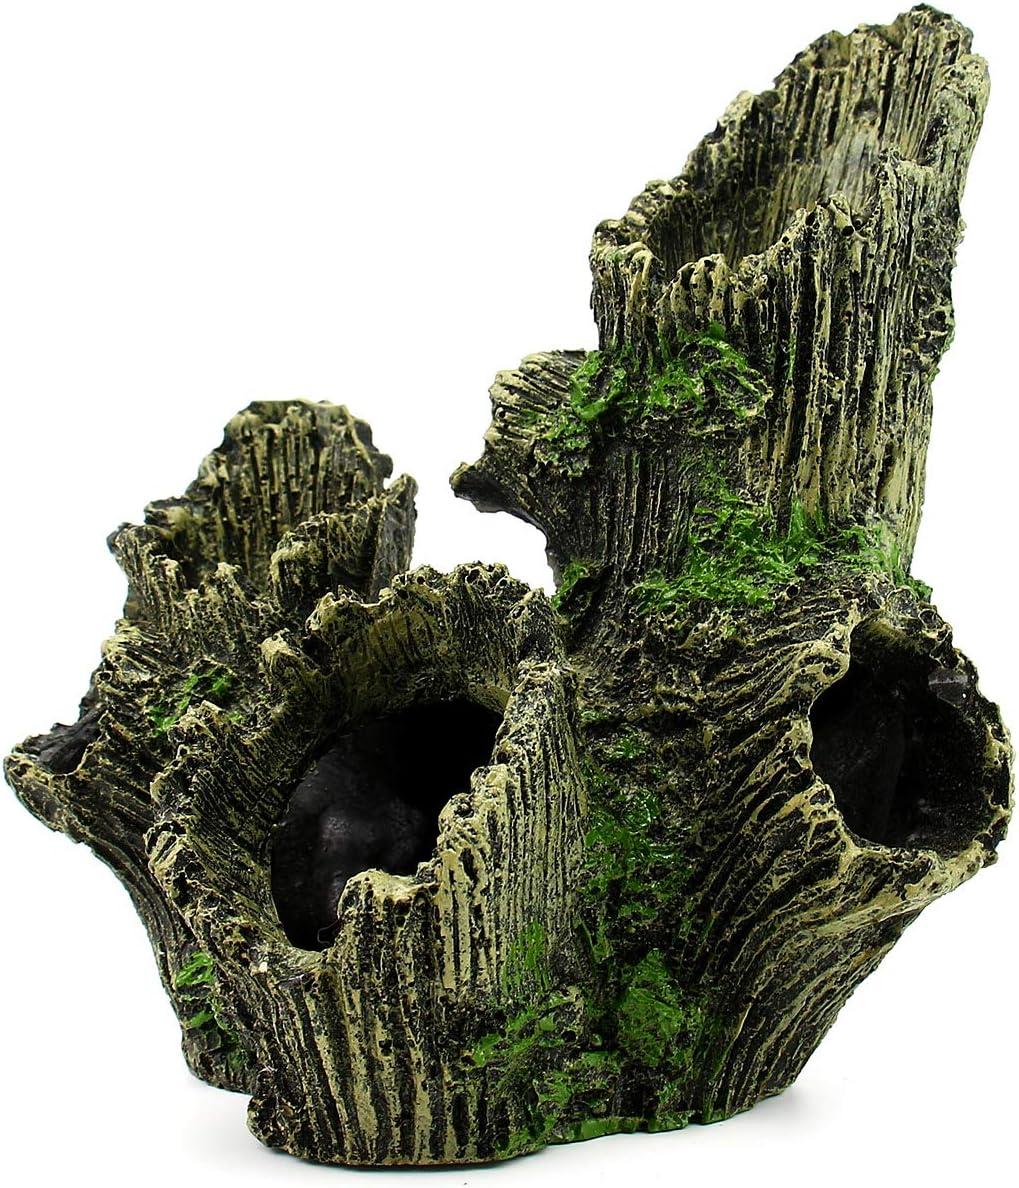 Dvirroi Large Hollow Tree Trunk Decor, 6.7'' X 4.7'' X 7.5'' Driftwood Cave Aquarium Decoration Betta Fish Ornament, Resin Log Fish Tank Decoration Wood with Holes Shrimp Hideout Hideaway Hiding Caves